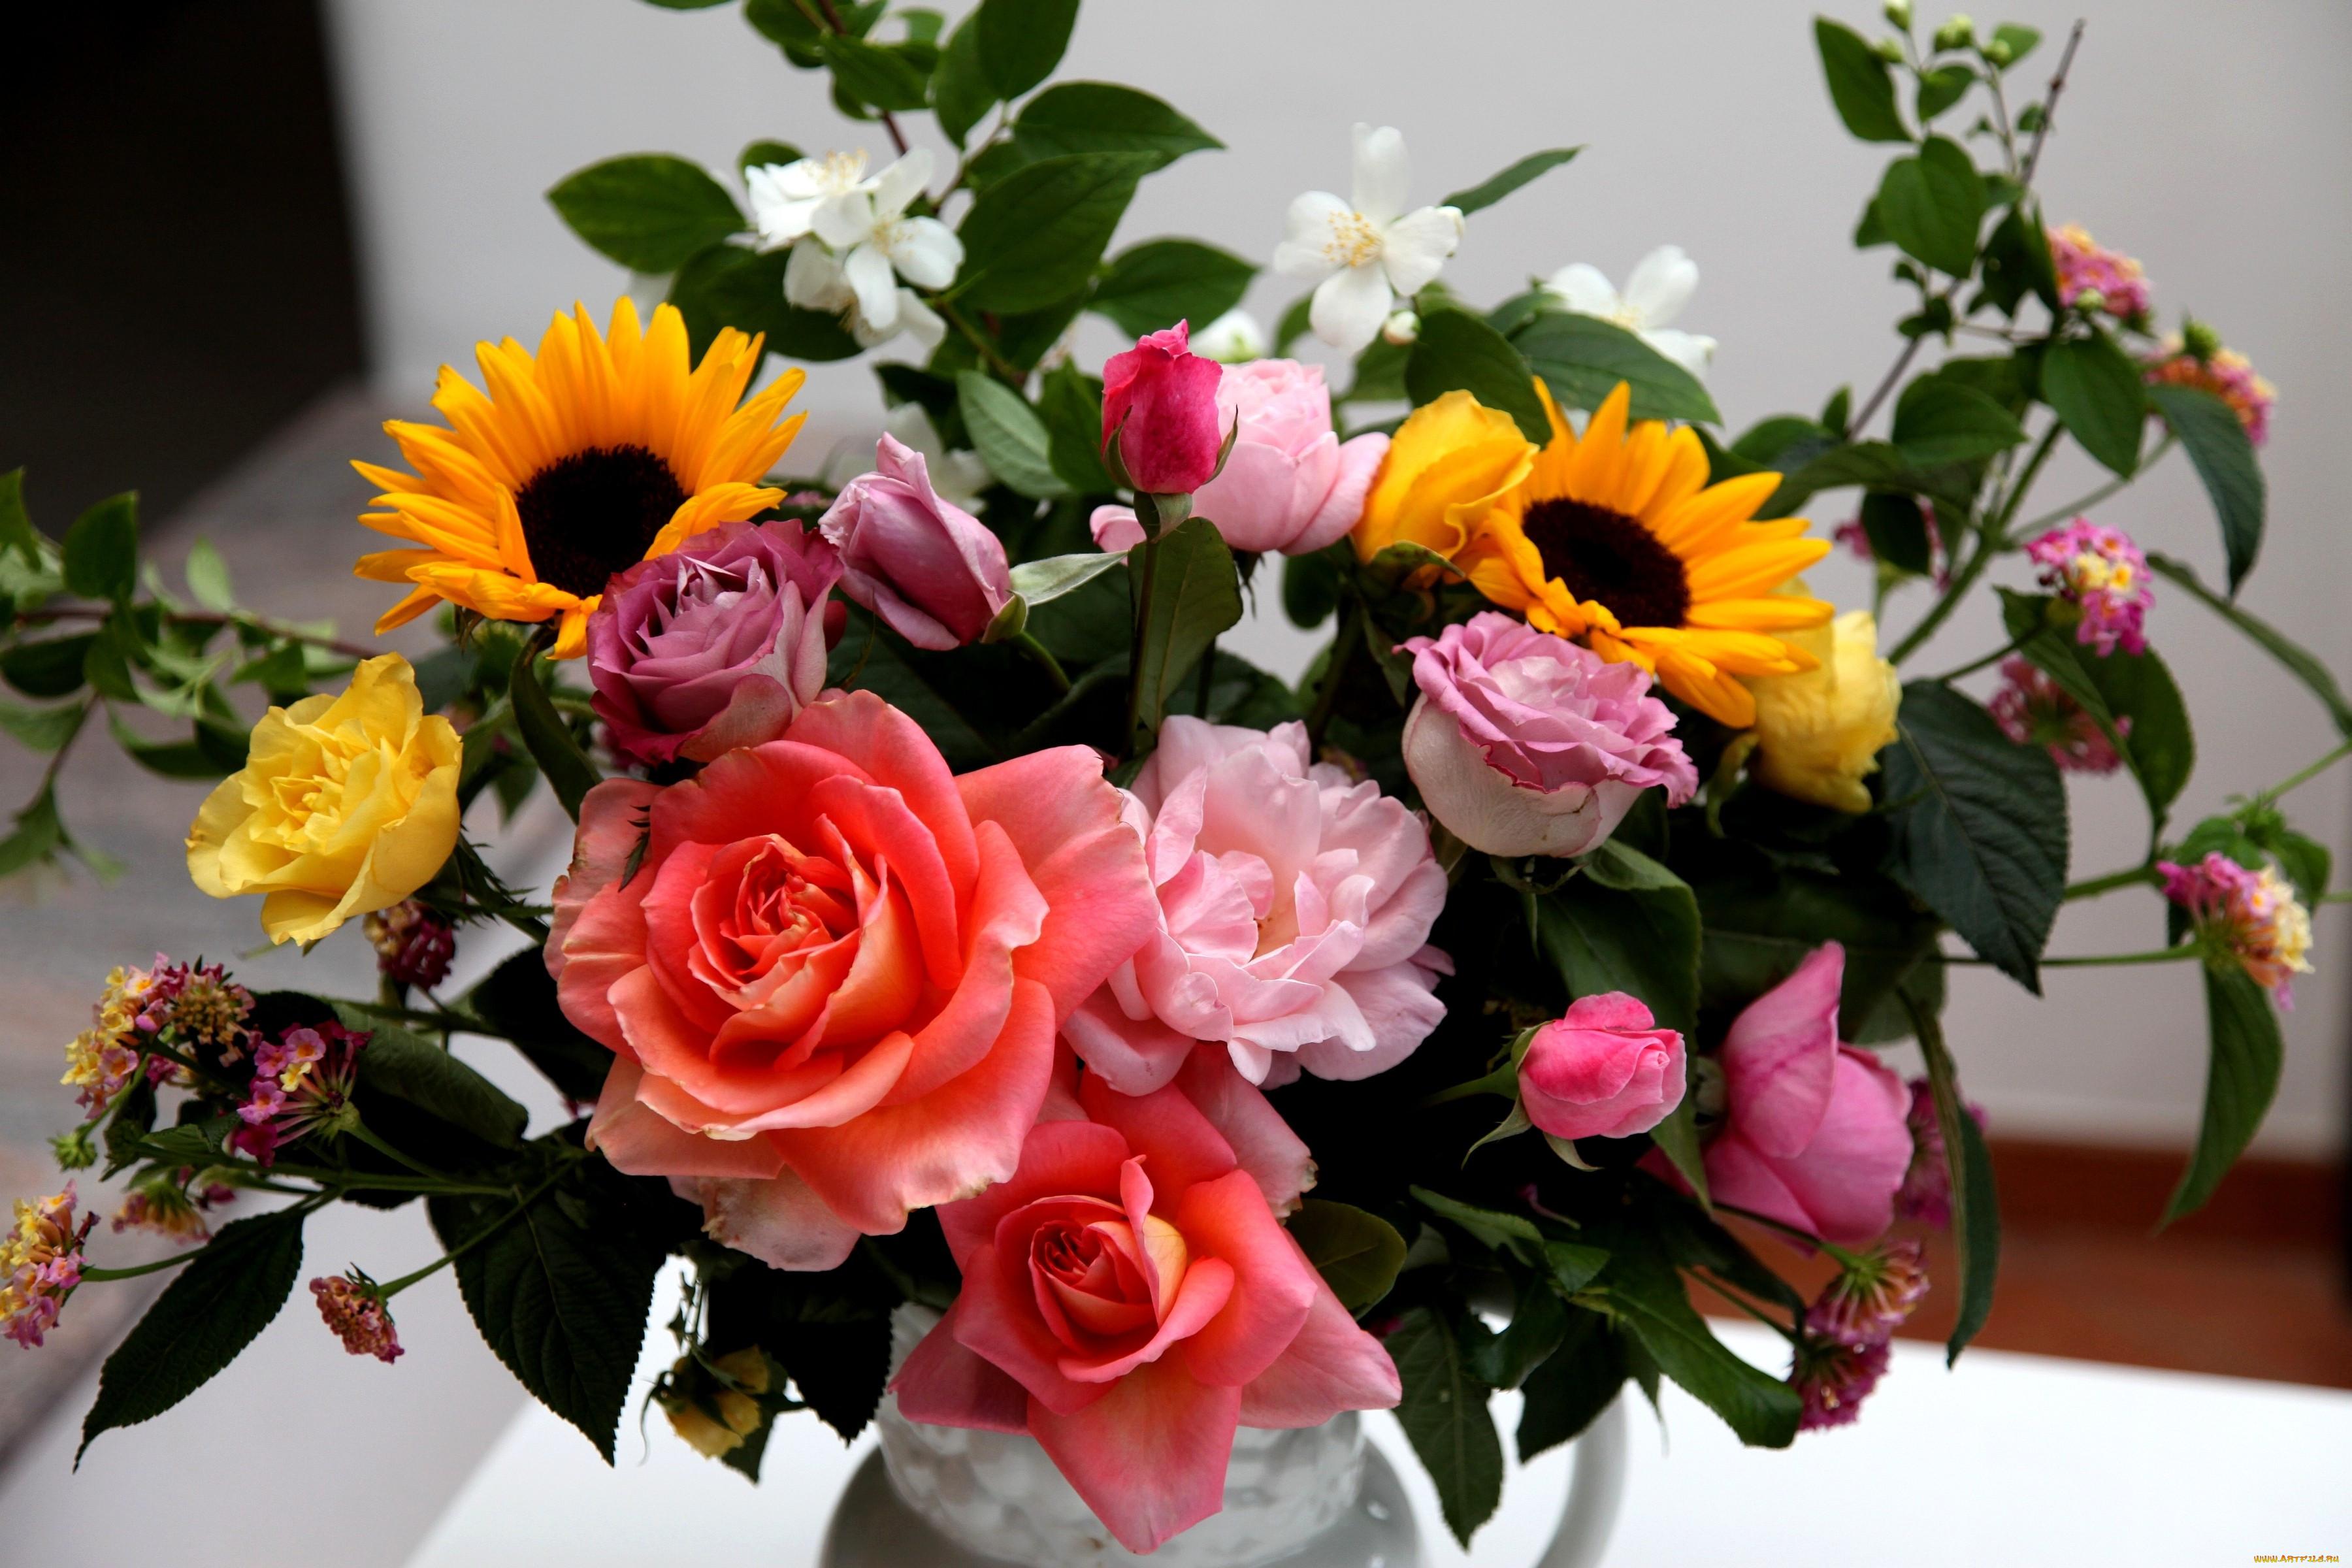 Картинки с цветами вьюн казани